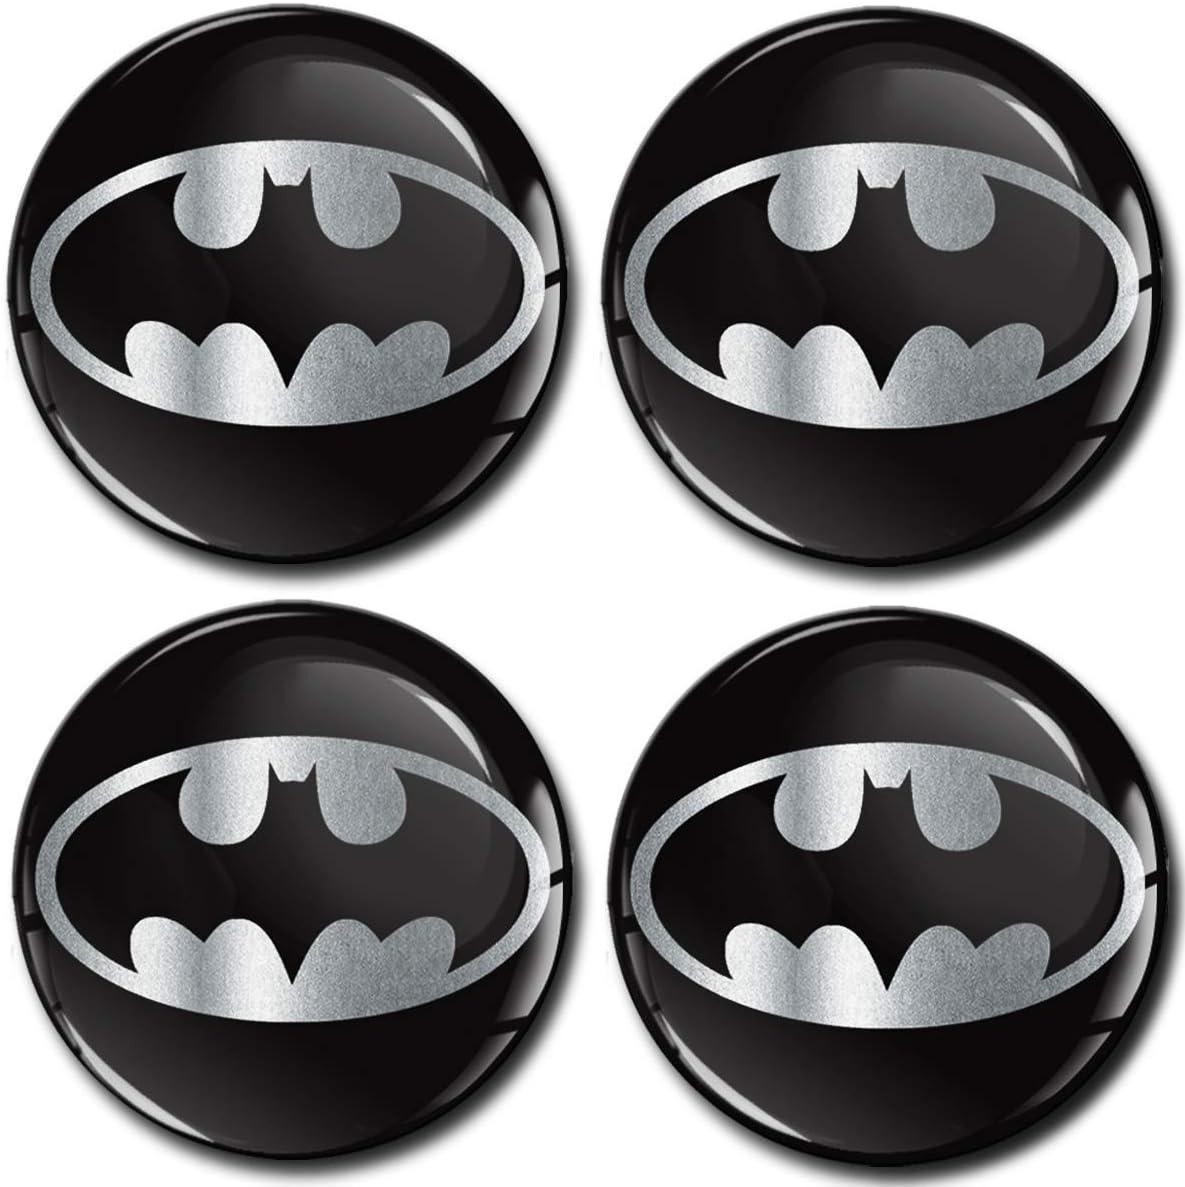 SkinoEu/® 4 x 56mm Aufkleber 3D Gel Silikon Autoaufkleber Stickers Batman Silber Felgenaufkleber F/ür Radkappen Nabenkappen Radnabendeckel Rad-Aufkleber Nabendeckel Auto Tuning A 7256